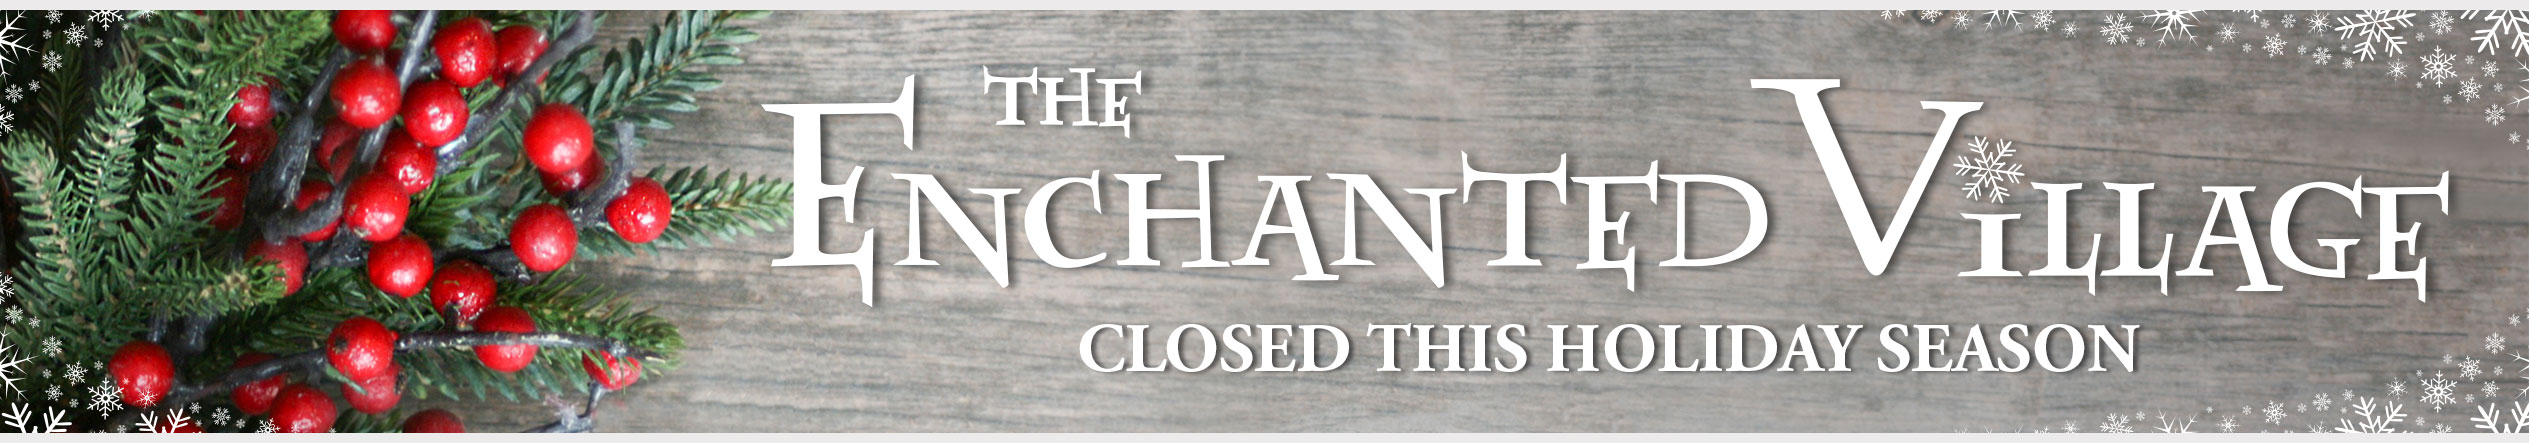 The Enchanted Village Opens November 13